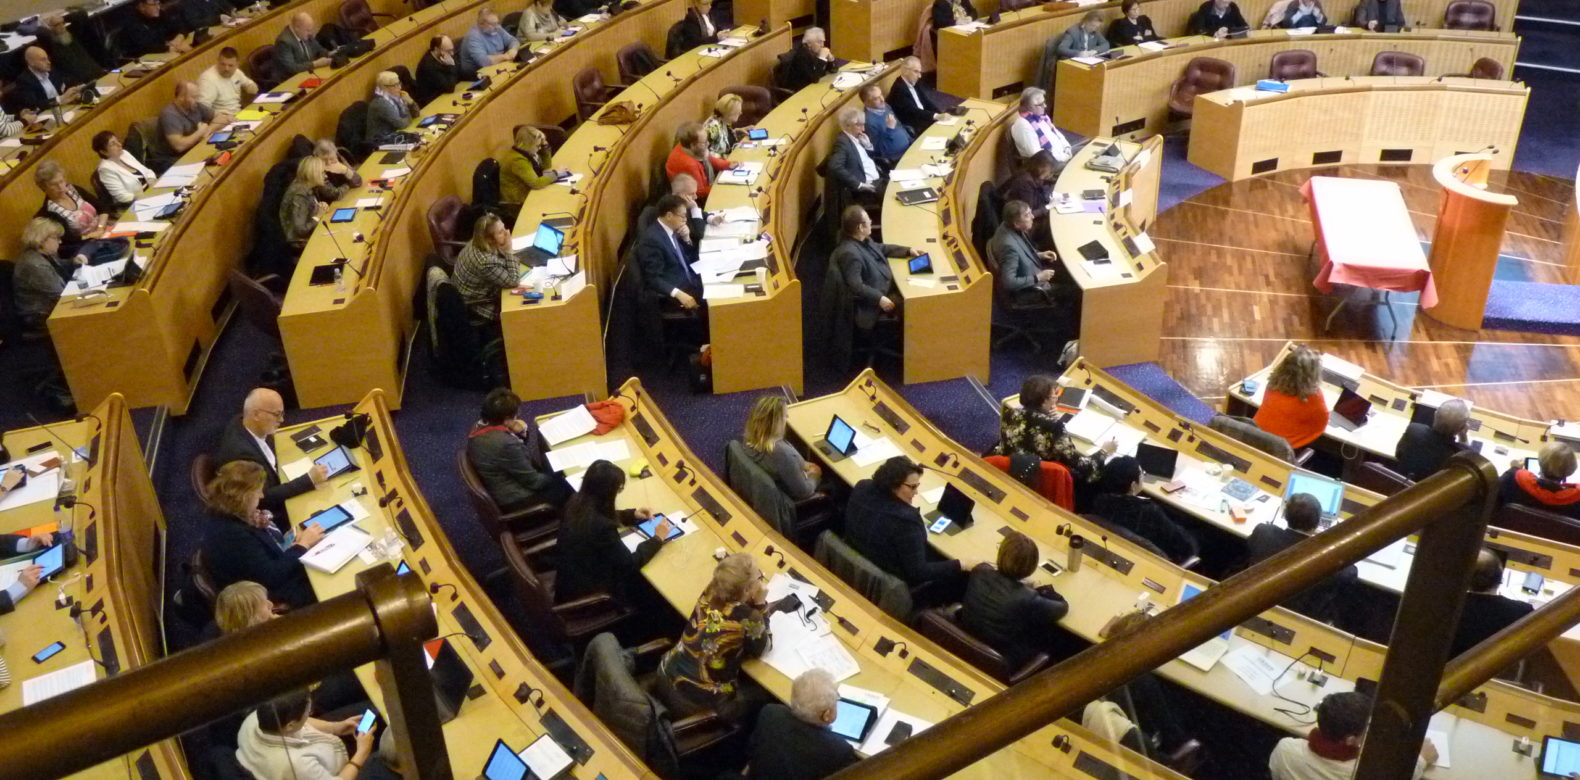 Plénière du 7 nov. 2019 | Avis adoptés